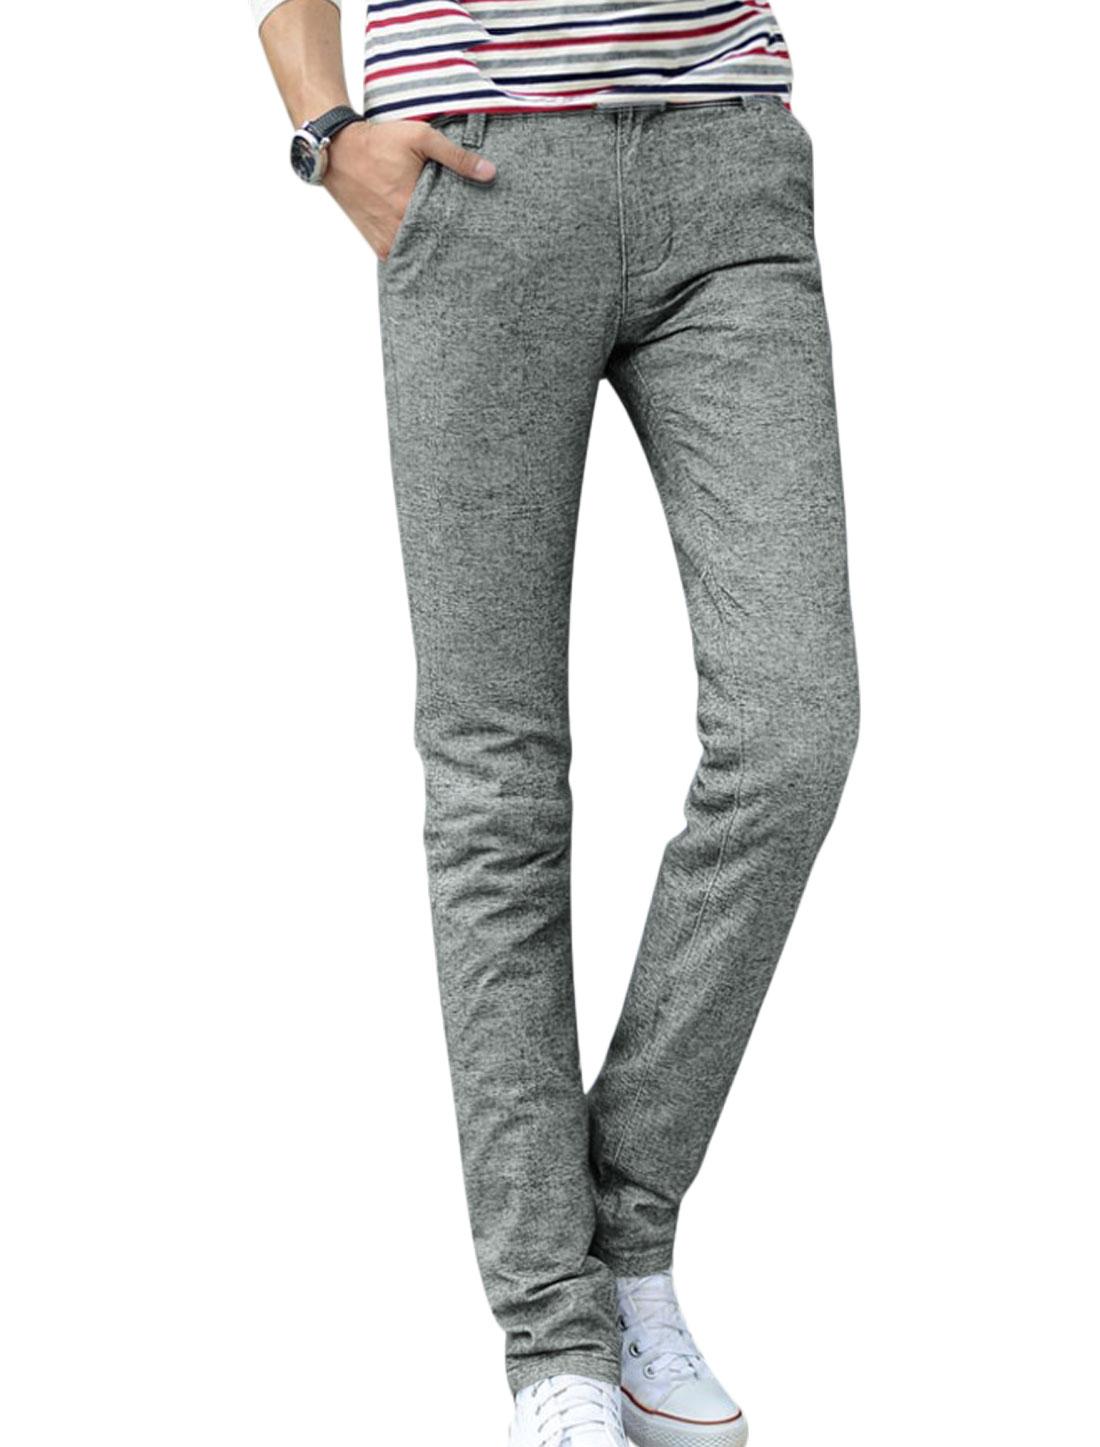 Men Light Cool Gray Mid Rise Zip Up Belt Loop Button Closure Jeans W32